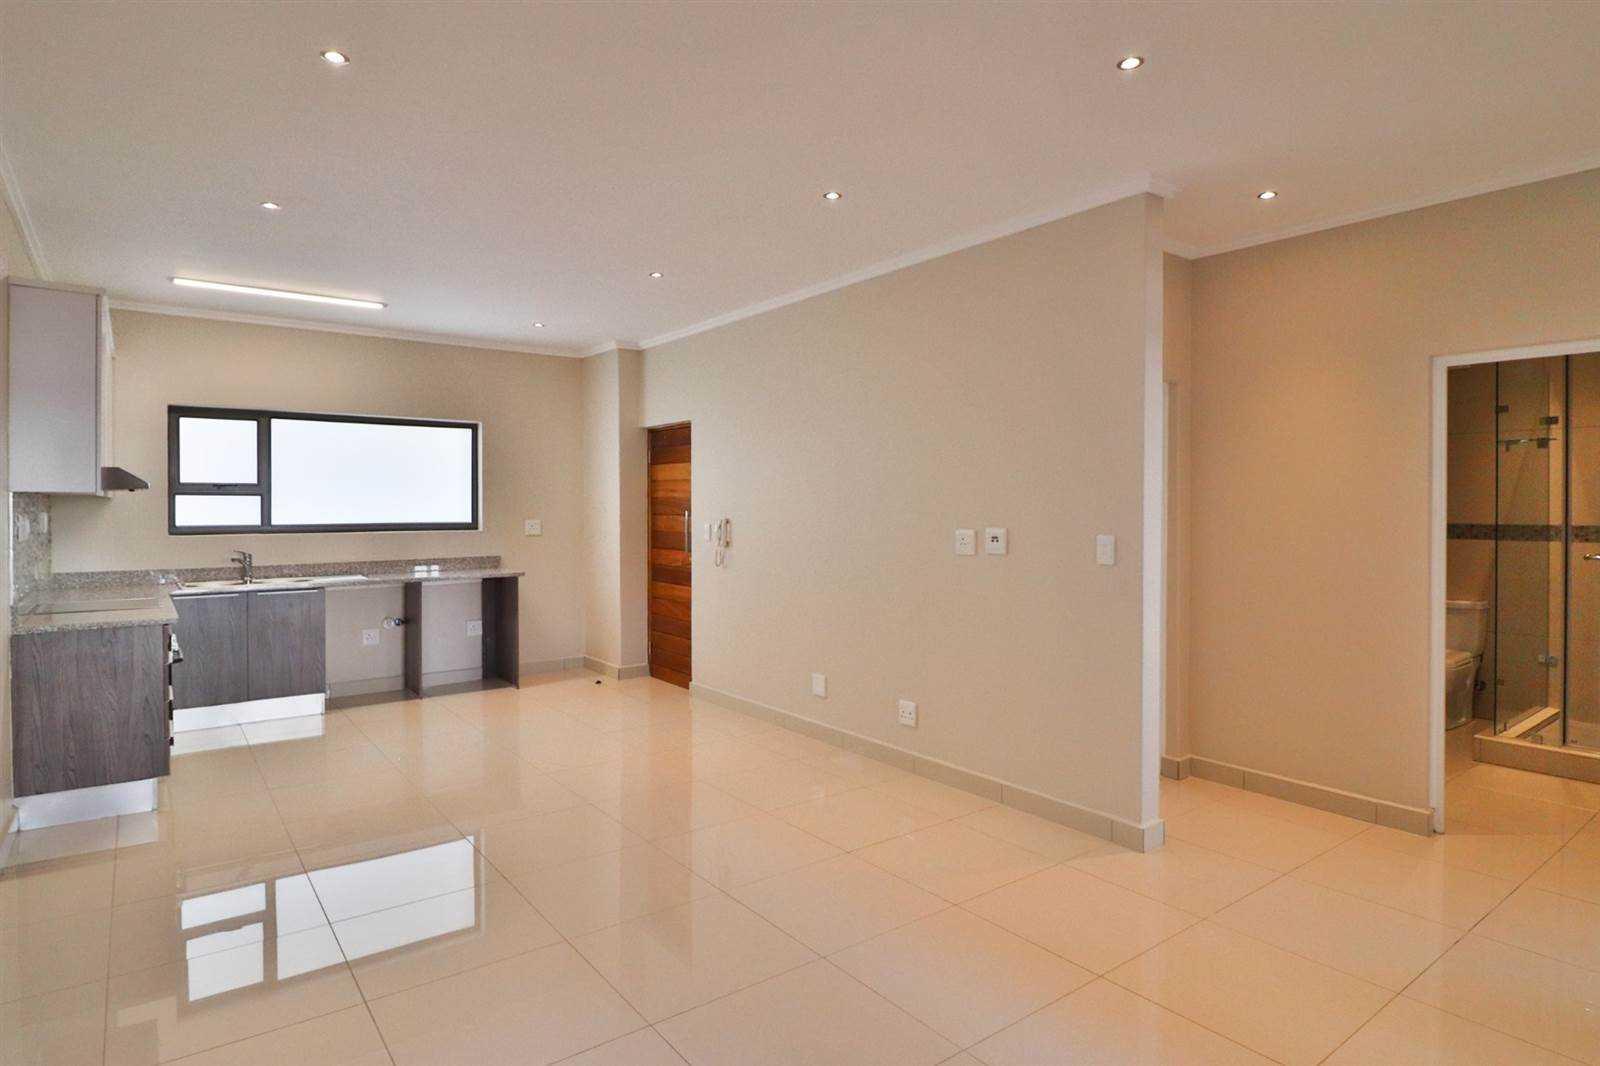 2 Bedroom Apartment For Sale in Umhlanga Ridge